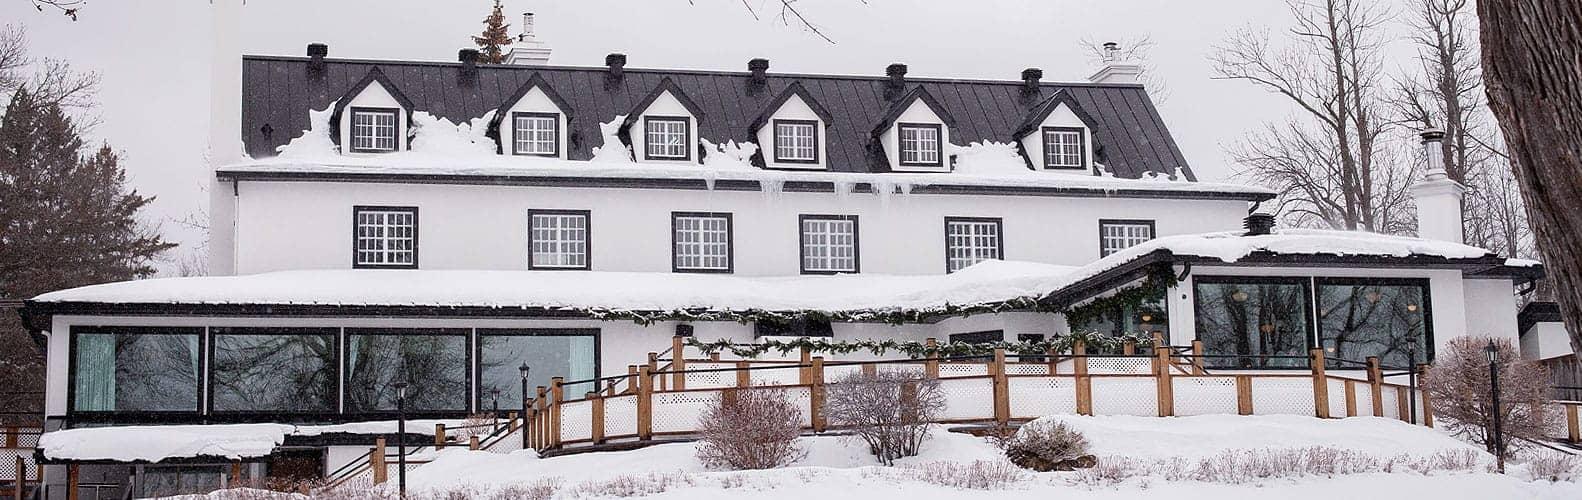 Retreat Menu and Agenda - The Auberge Willow Inn